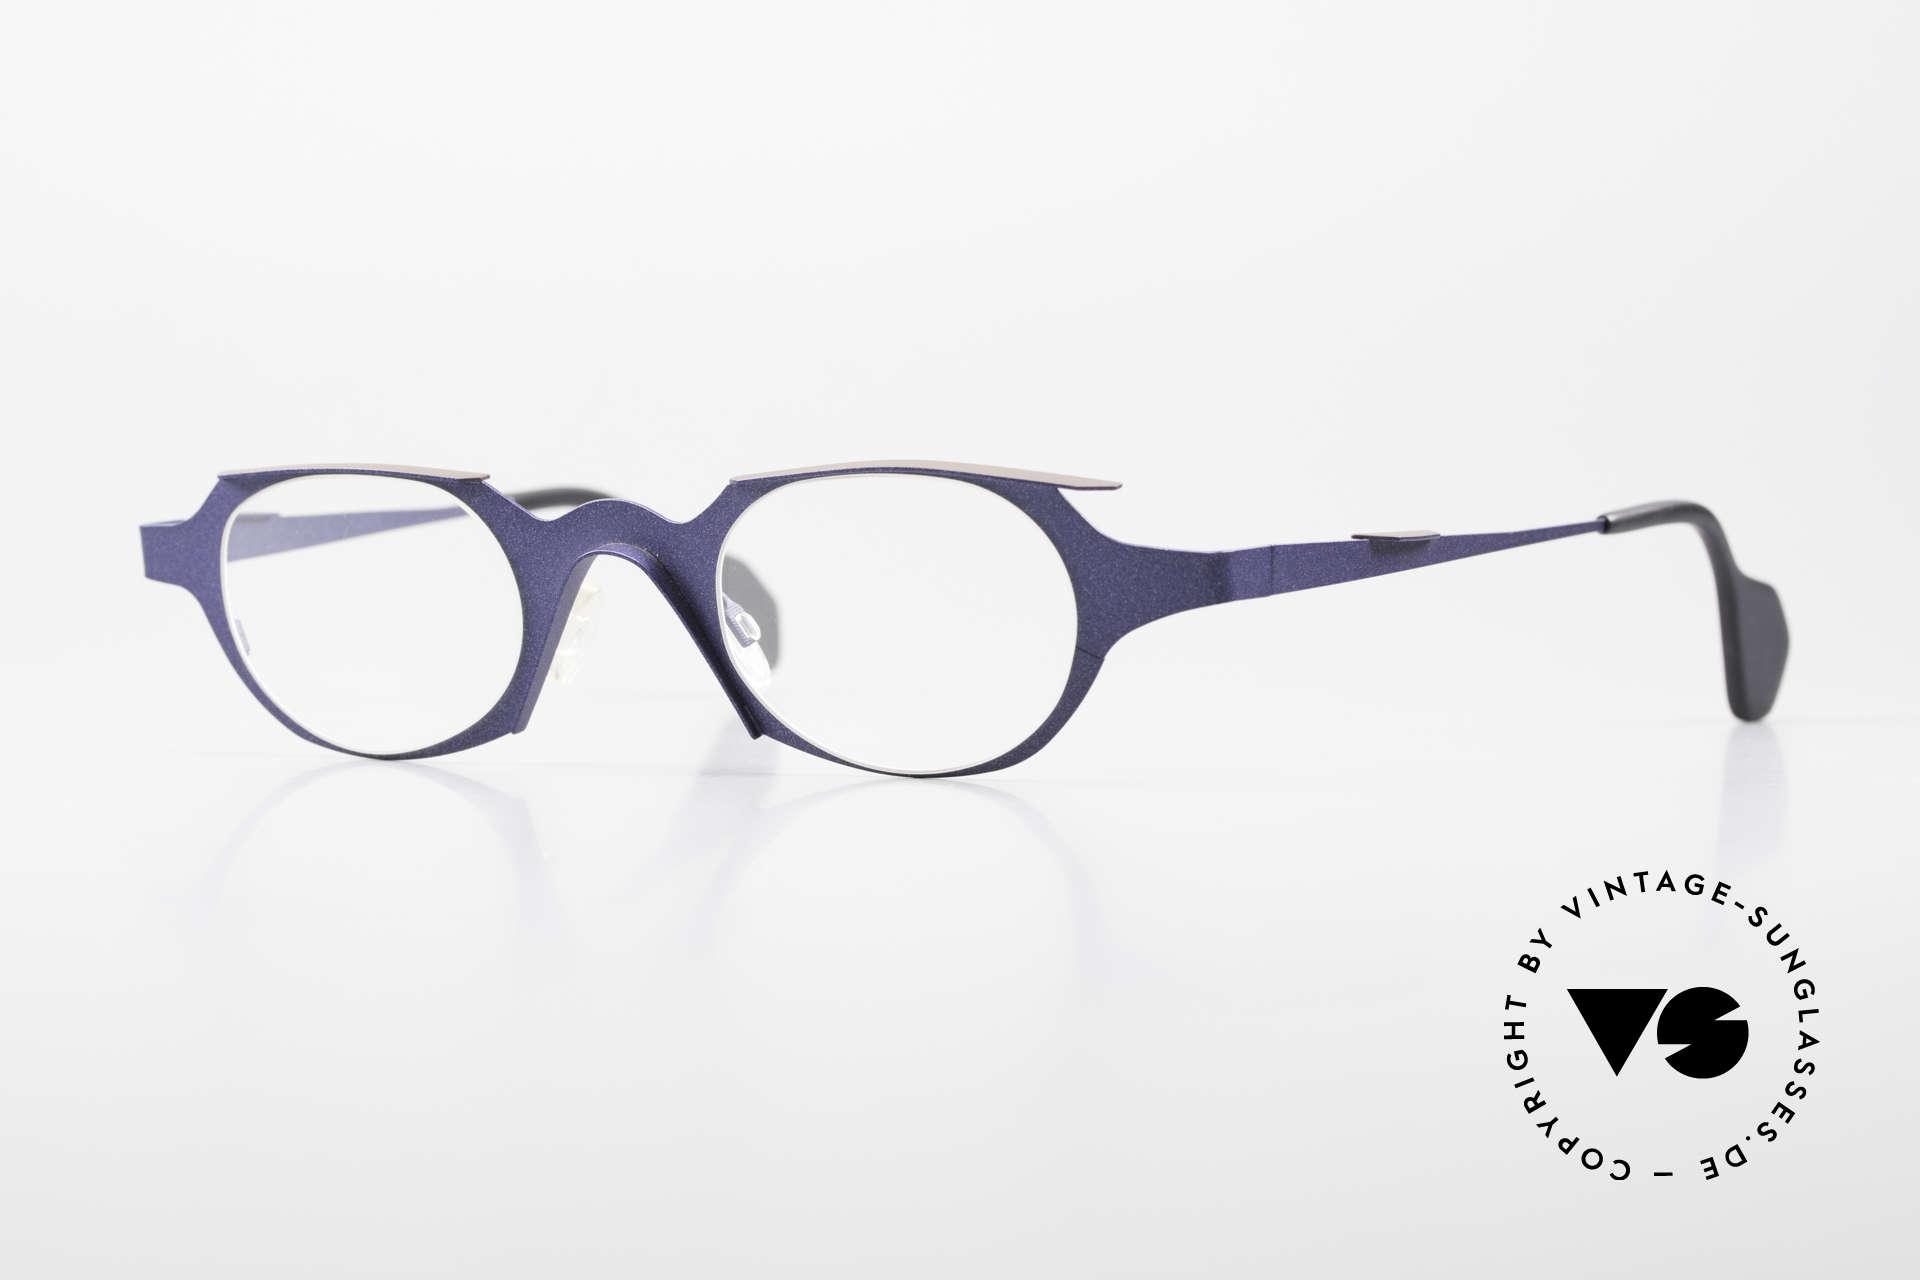 "Theo Belgium Eye-Witness OB Avantgarde Damenbrille 90er, Theo Belgium Damenbrille der ""Eye-Witness"" Baureihe, Passend für Damen"